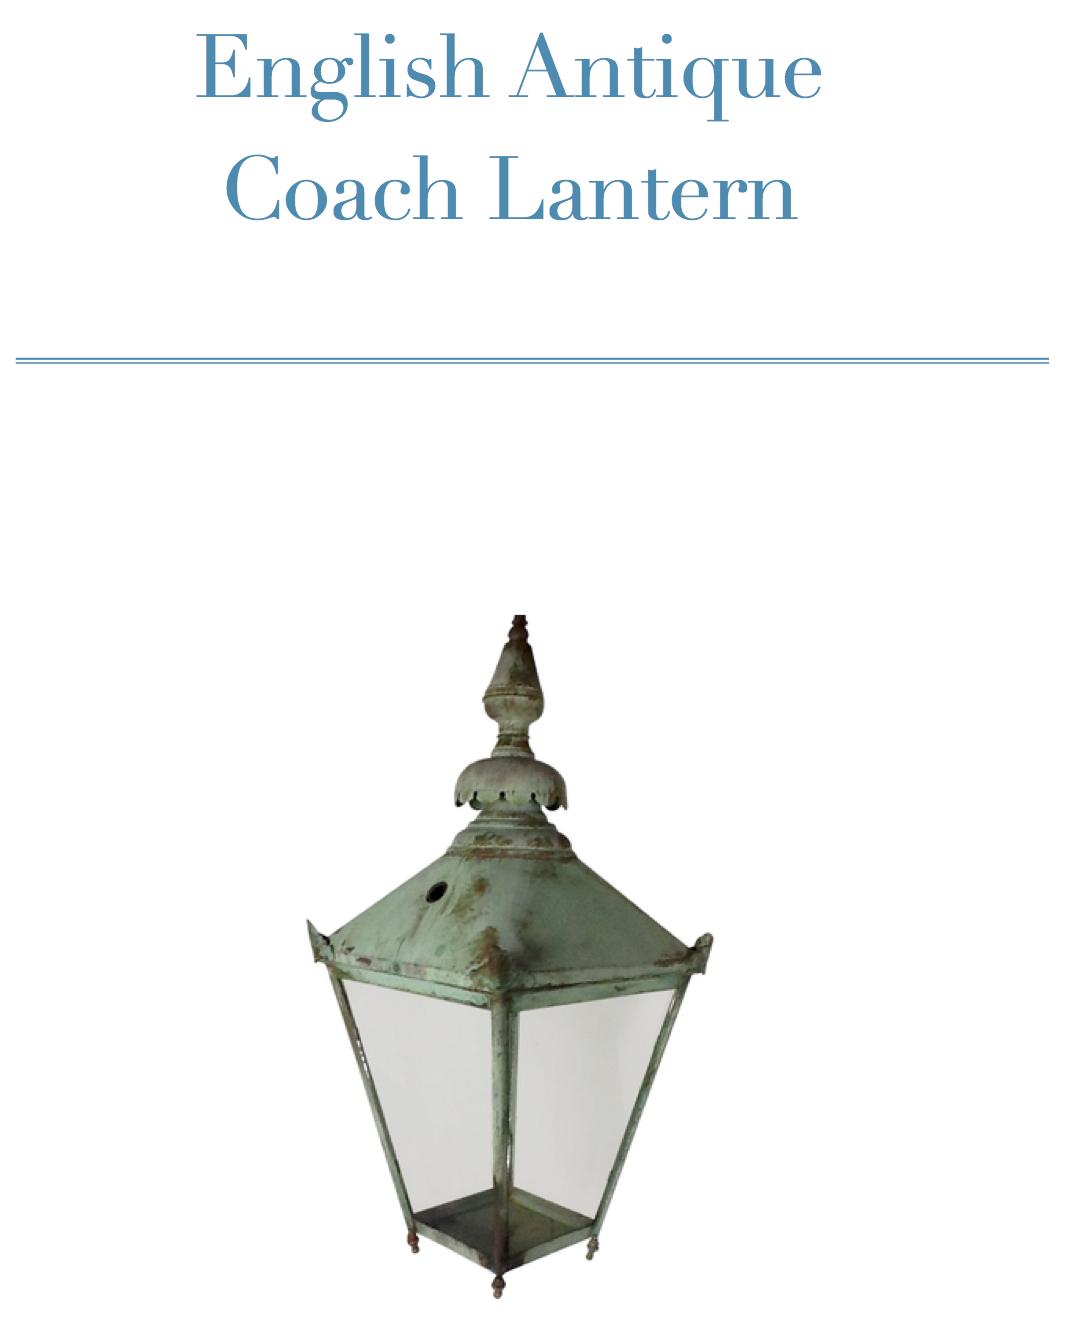 English Antique Coach Lantern